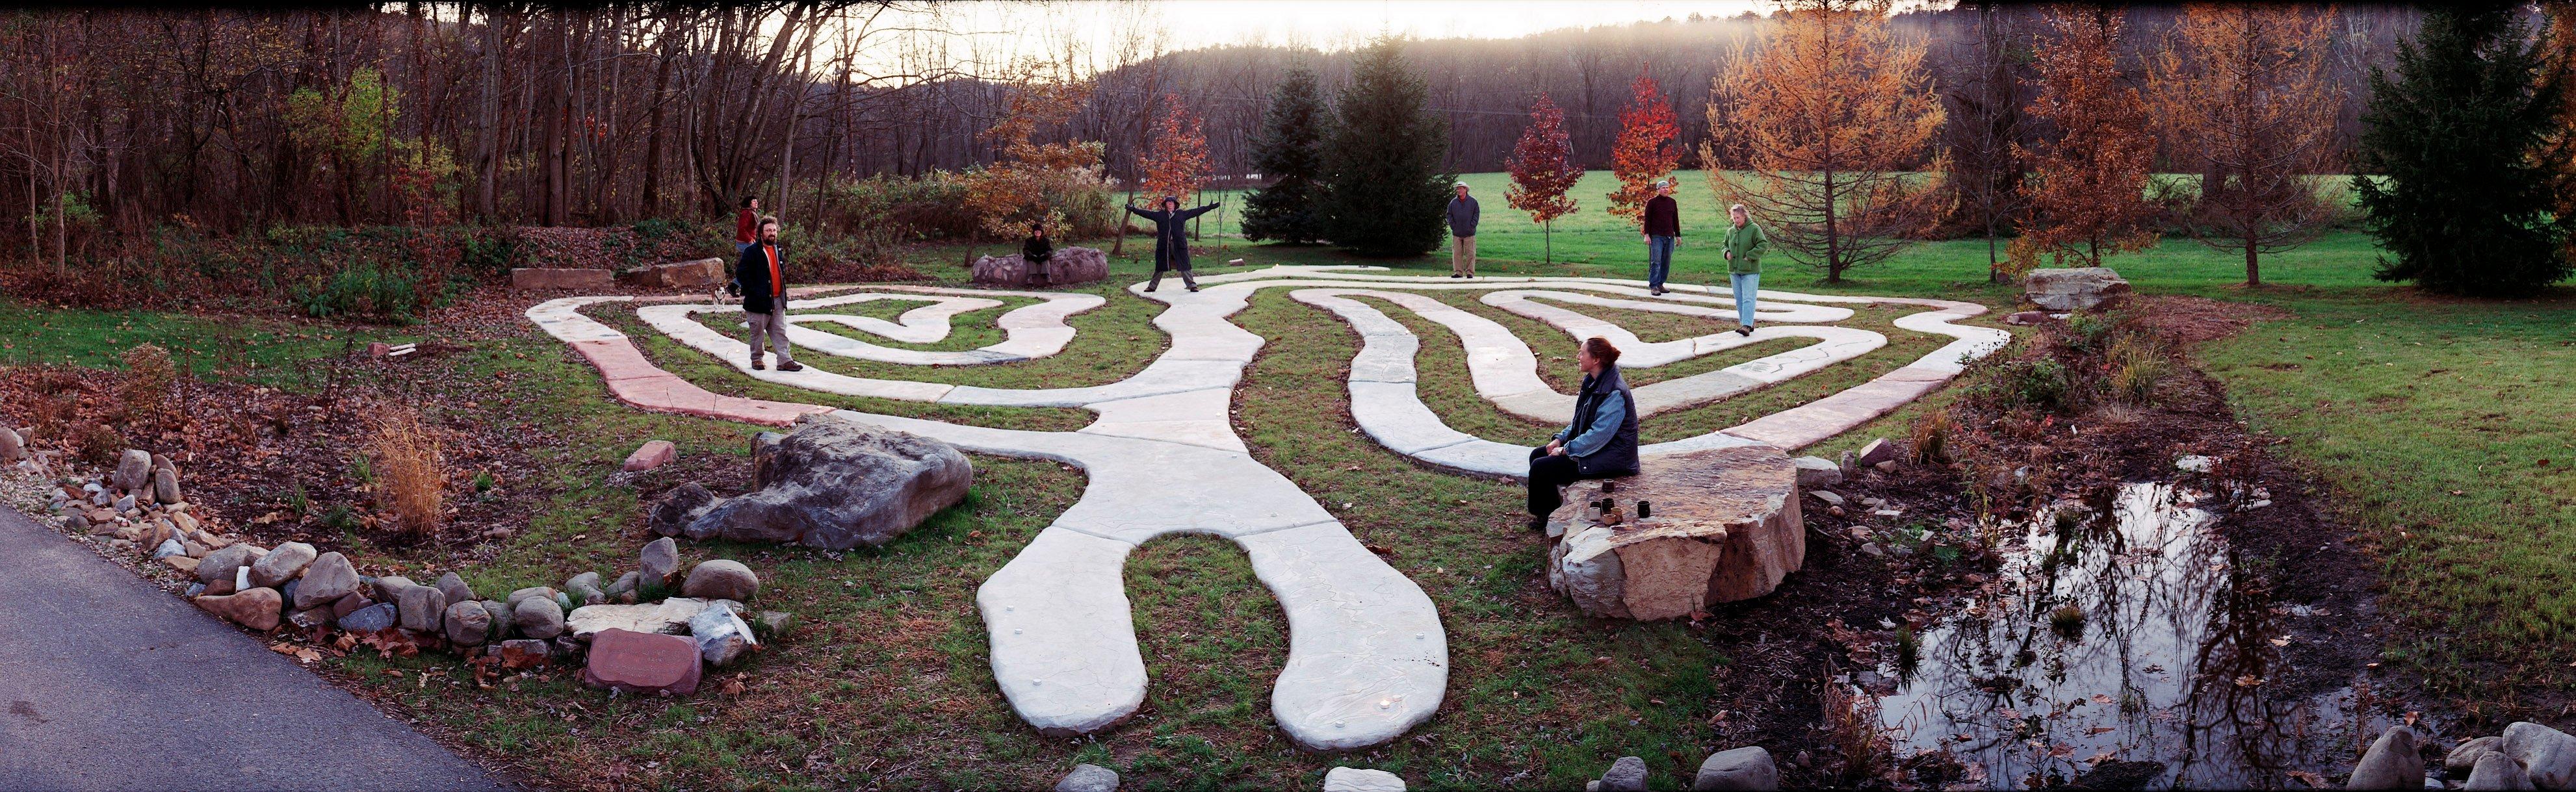 RiverWise Labyrinth Park